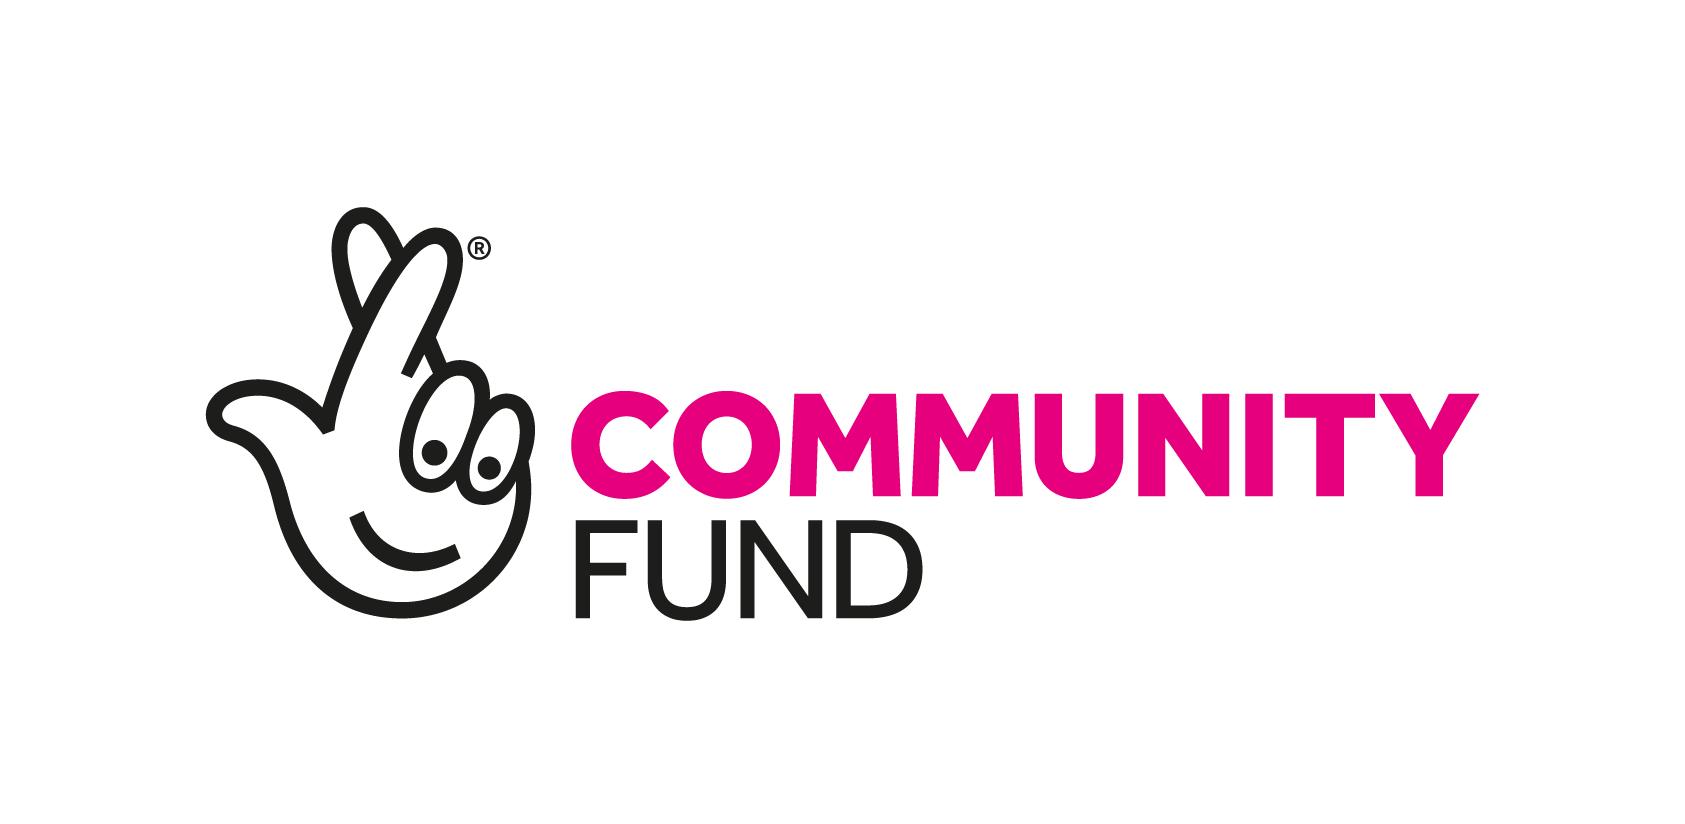 https://d1ssu070pg2v9i.cloudfront.net/pex/dfc_community/2020/06/24121502/Lottery-Community-Fund-Logo.png